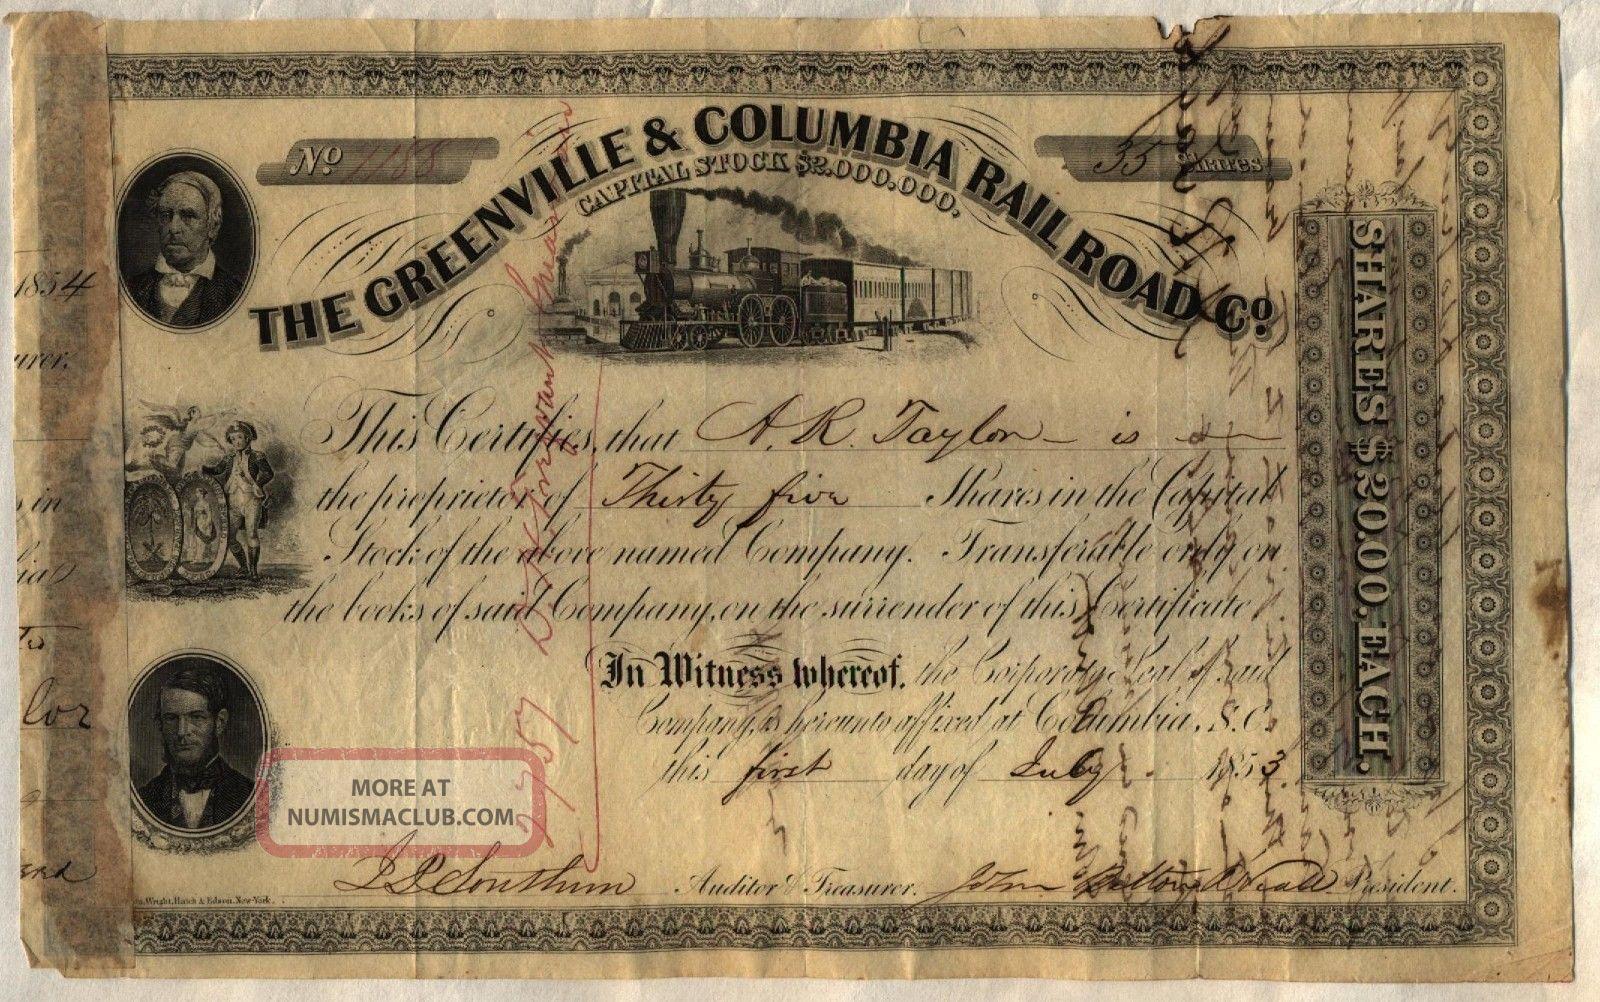 1853 Greenville & Coumbia Railroad Co.  Stock Certificate South Carolina Transportation photo